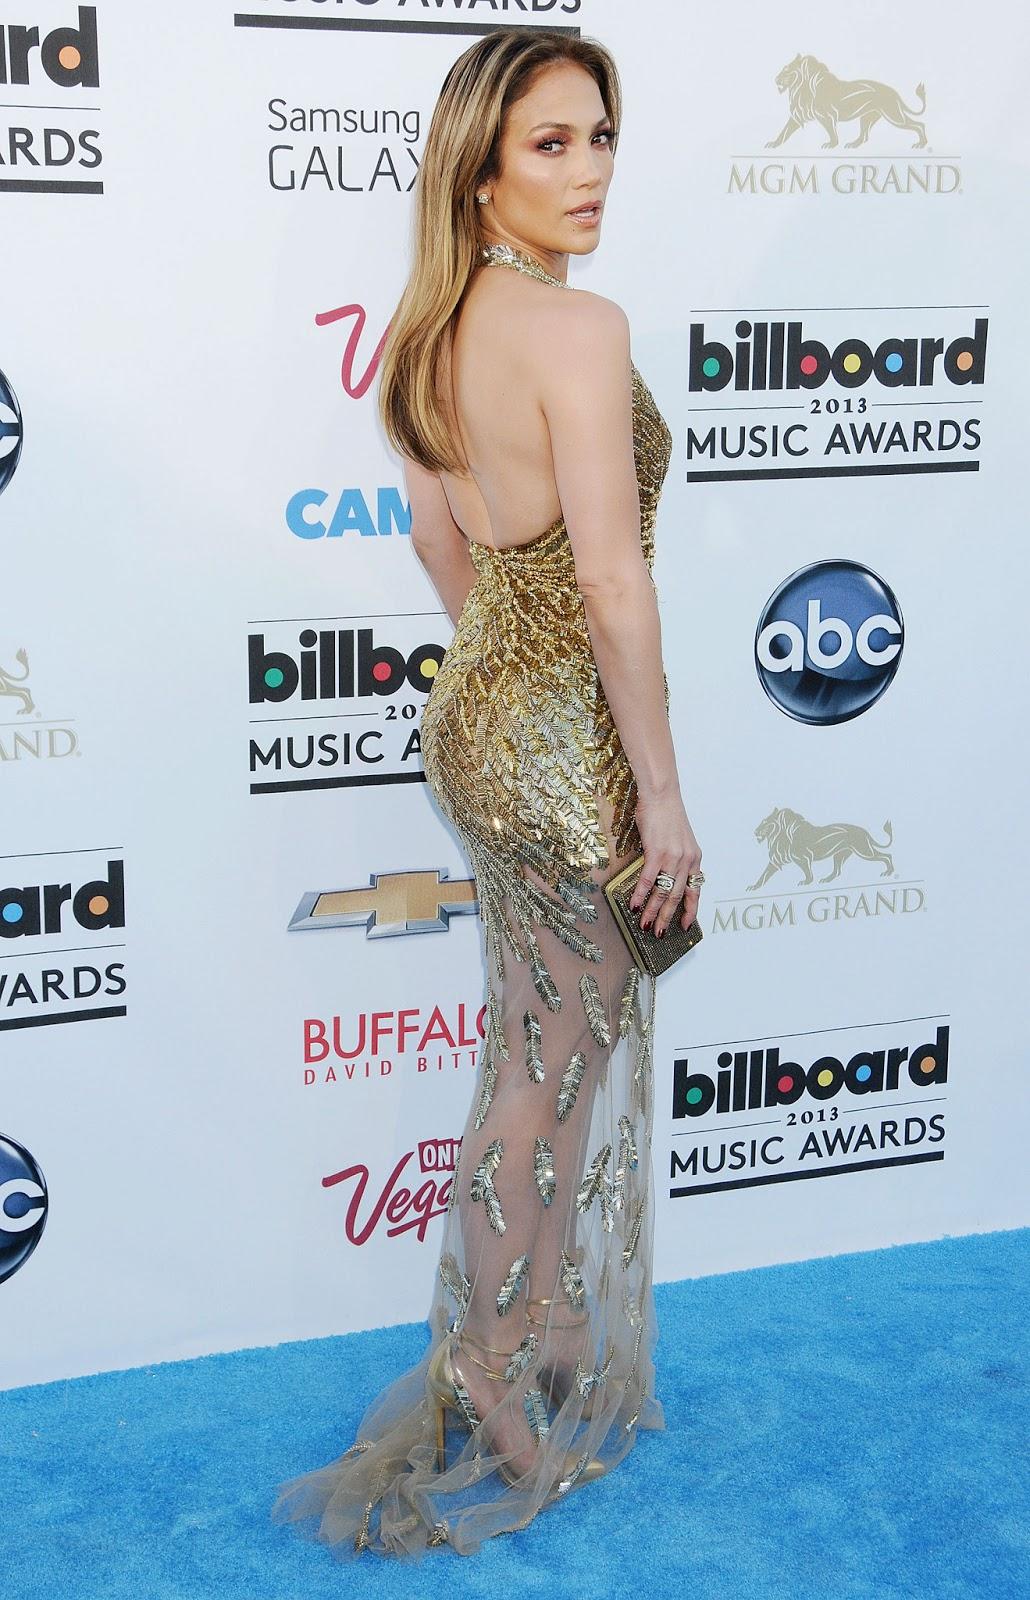 Billboard Music Awards 2016 The Best Hair And Makeup: Jennifer Lopez - 2013 Billboard Music Awards